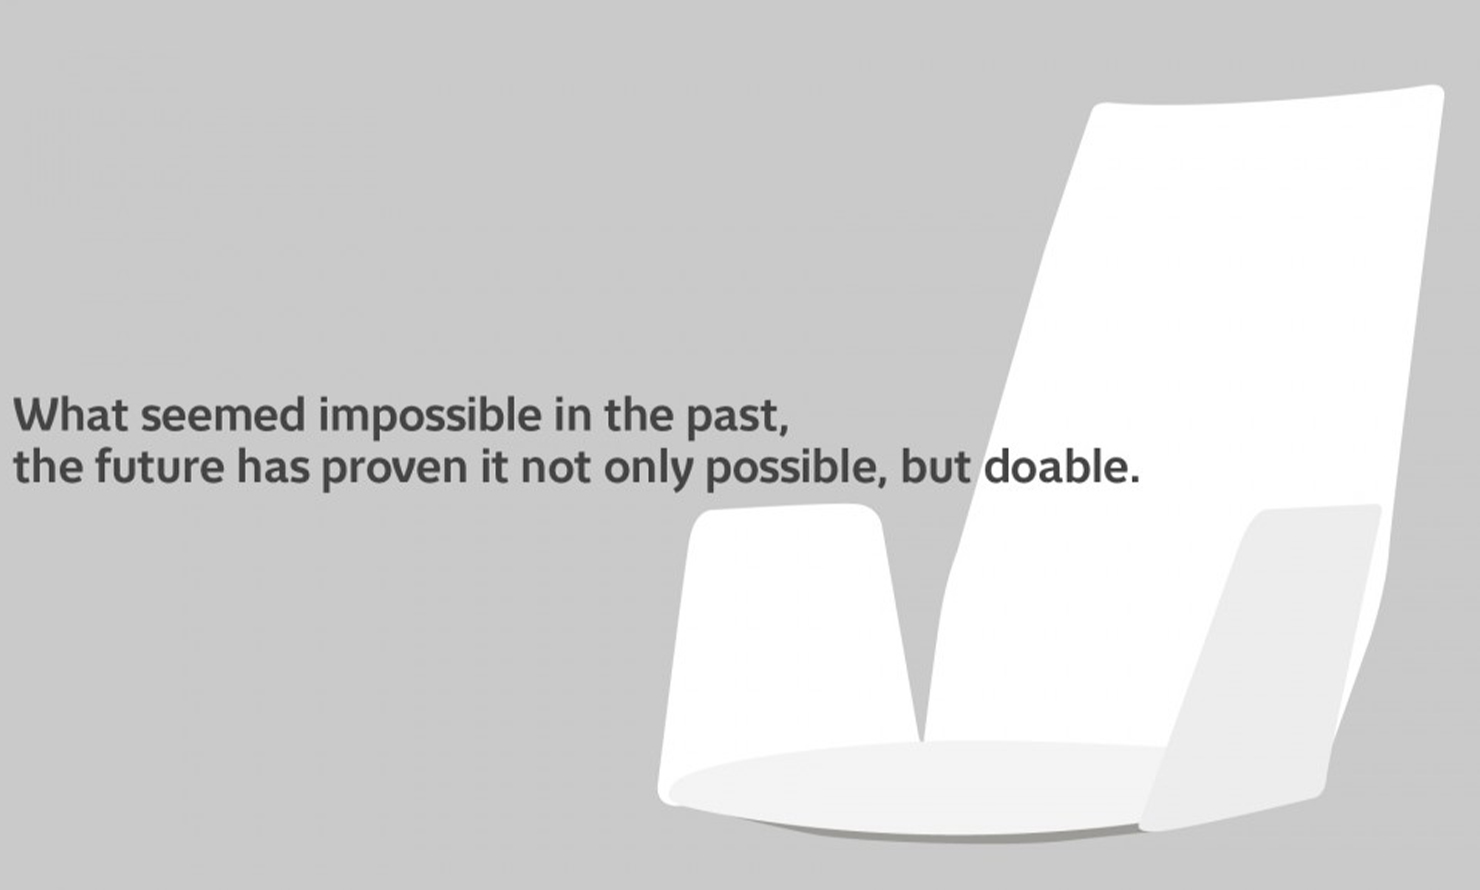 https://www.kubelibre.com/uploads/Slider-work-tutti-clienti/tecno-redesigning-the-future-of-the-future-of-work-2.jpg